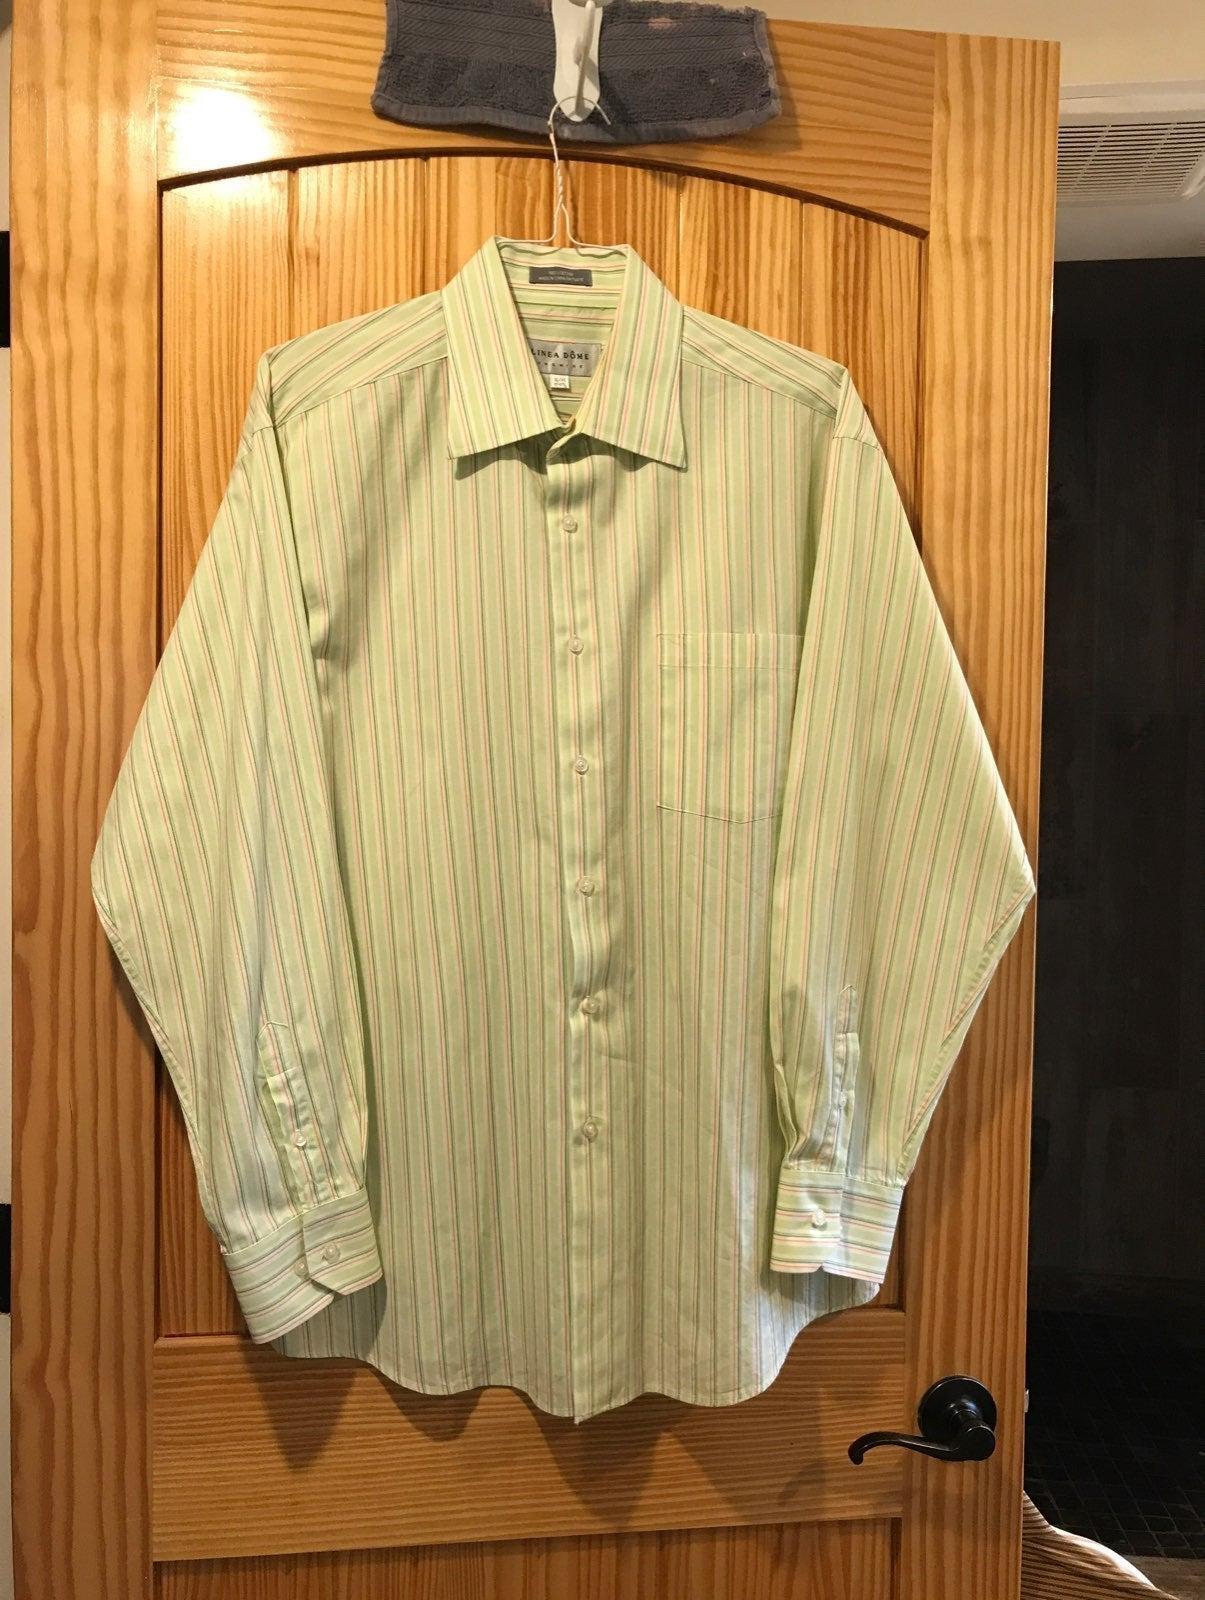 NWOT-Men's Linea Dome Chemise Dress Shir